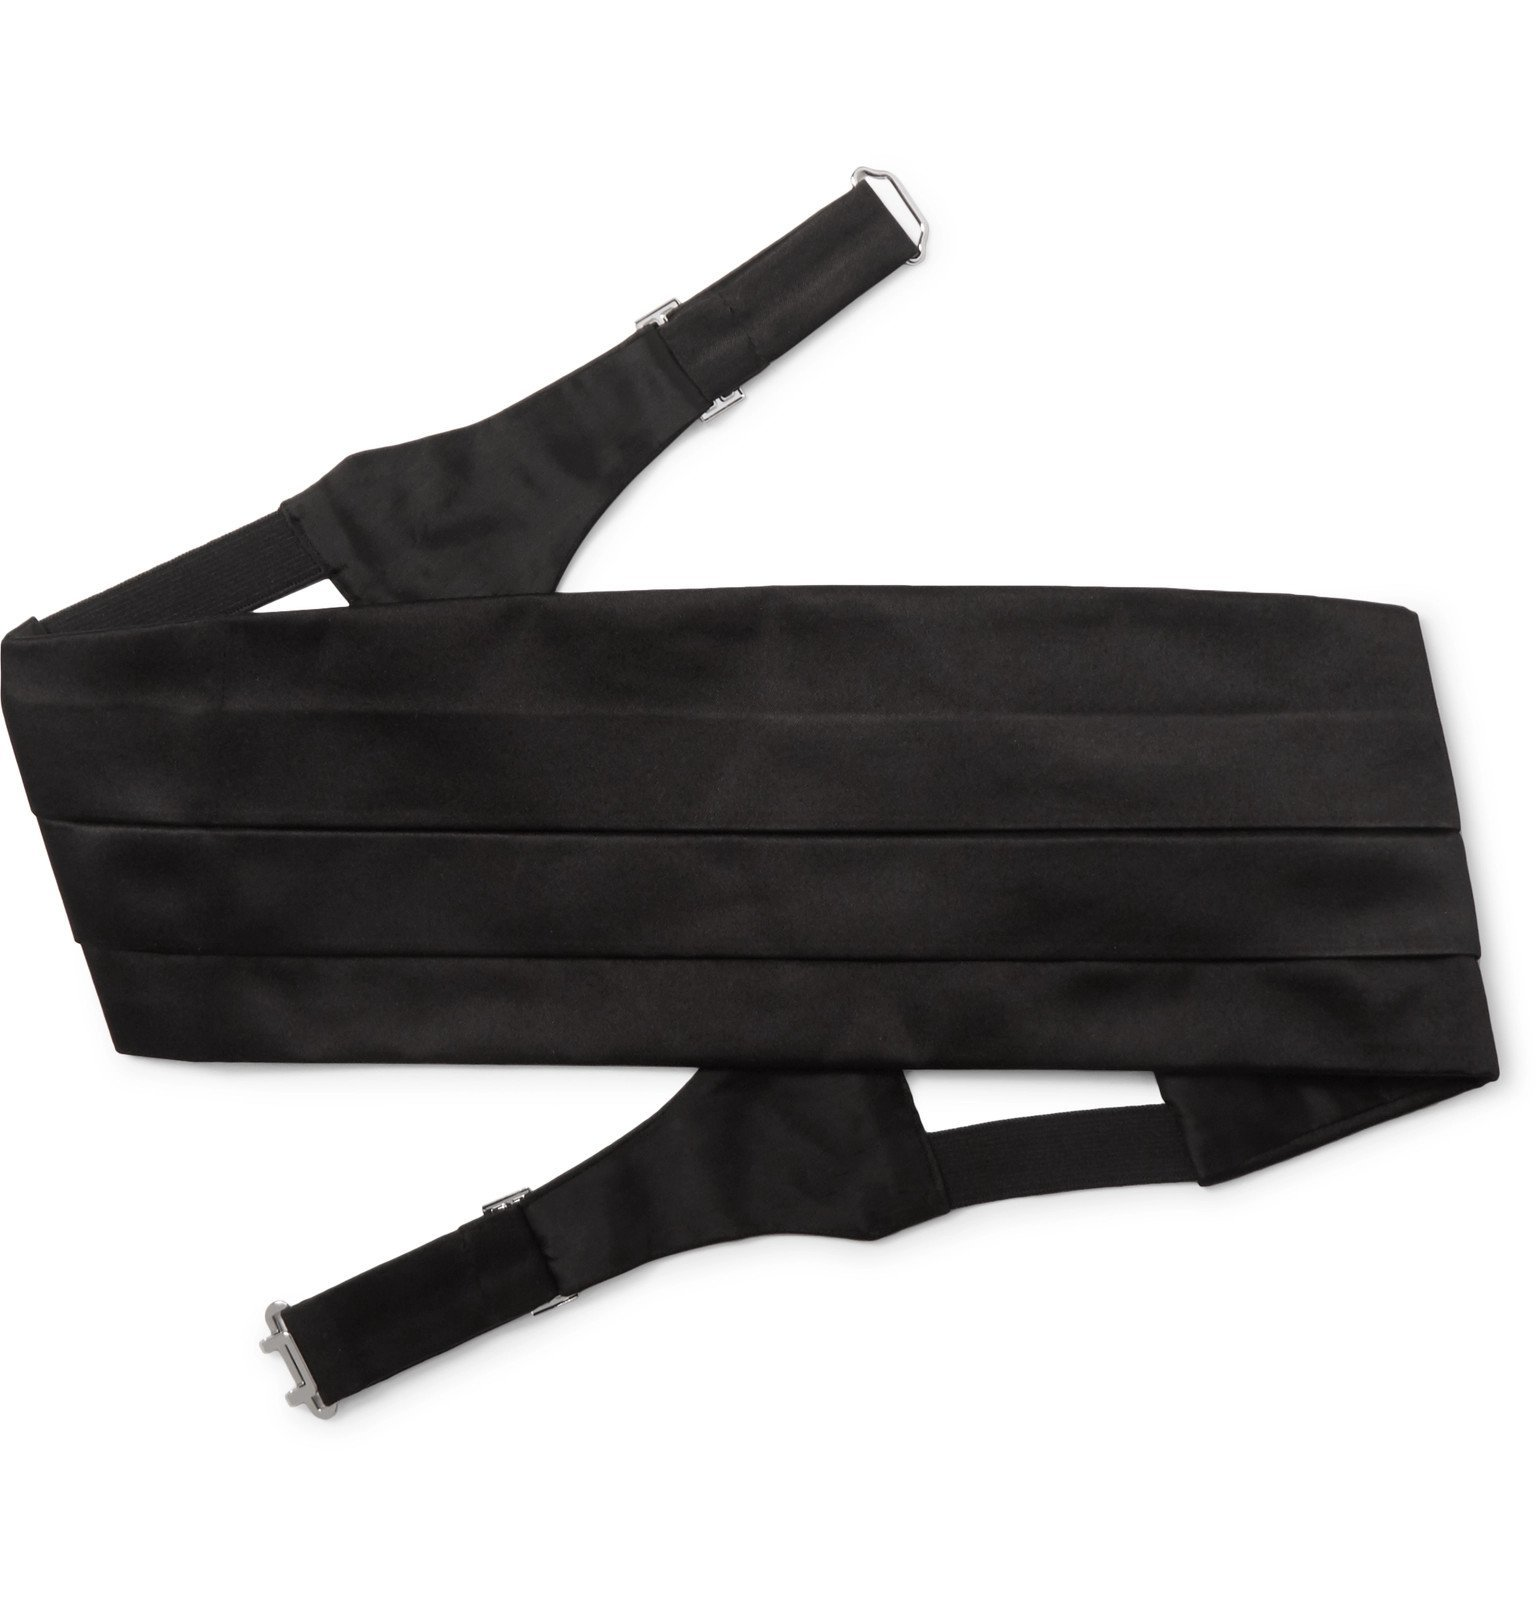 Giorgio Armani - Silk-Satin Cummerbund - Black